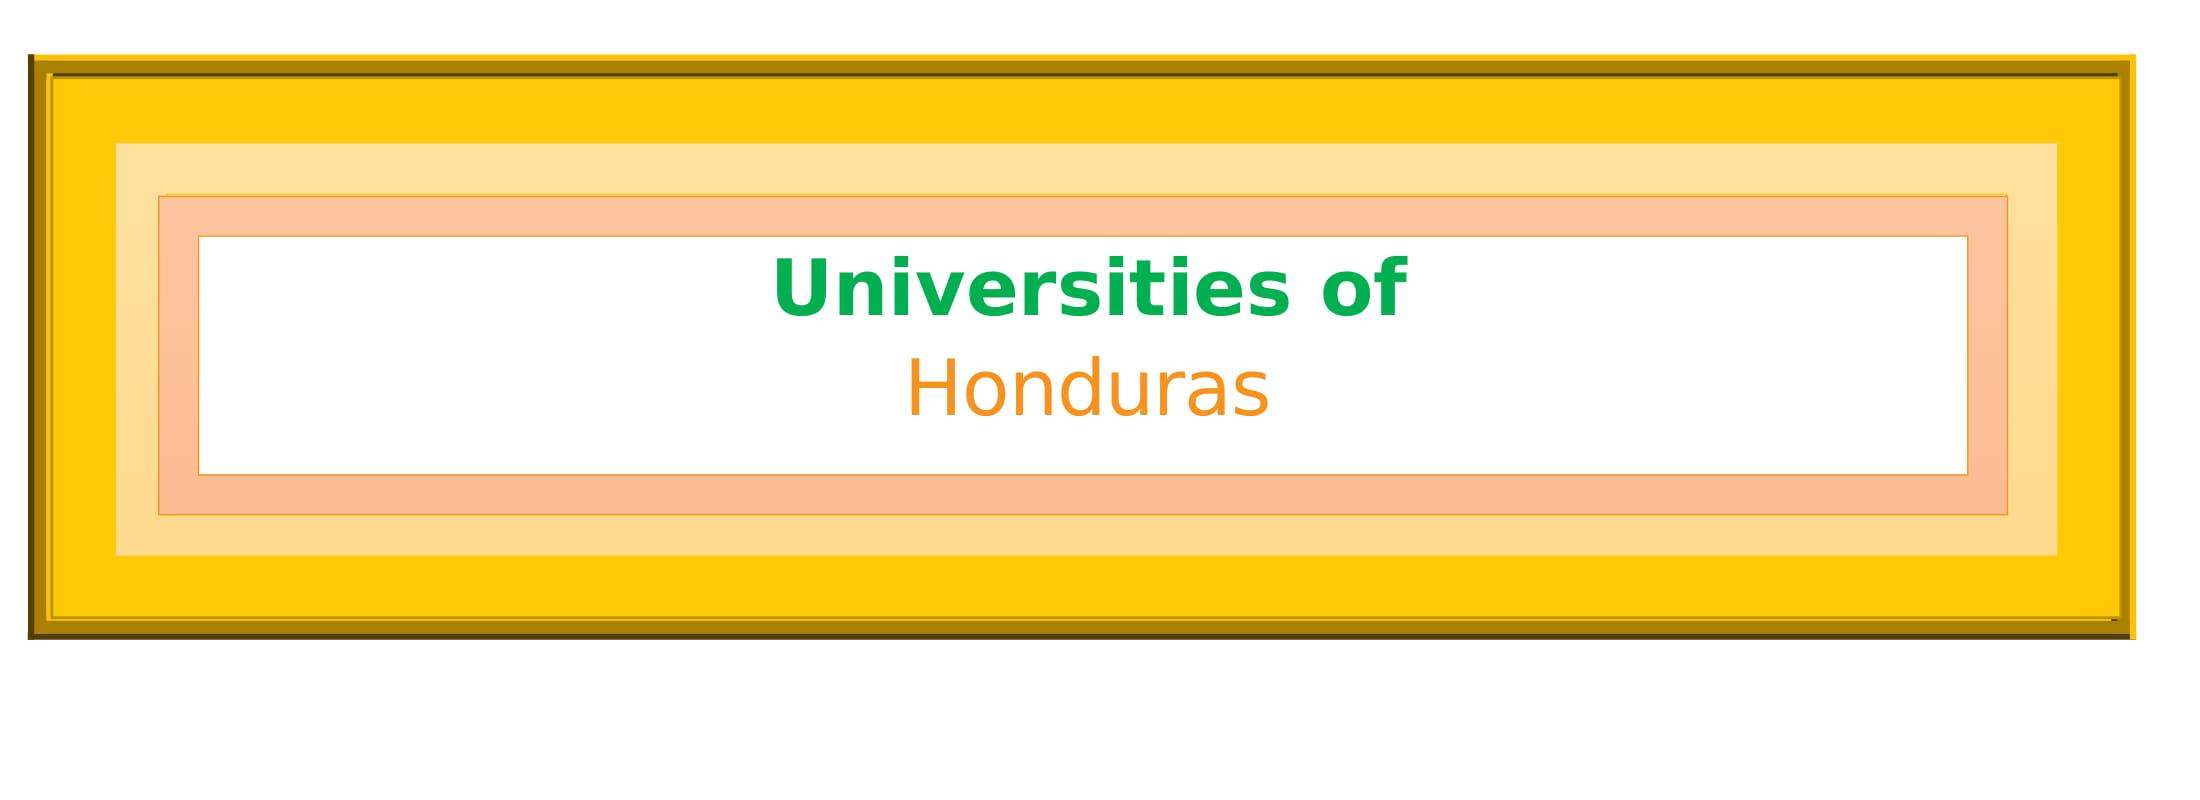 List of Universities in Honduras